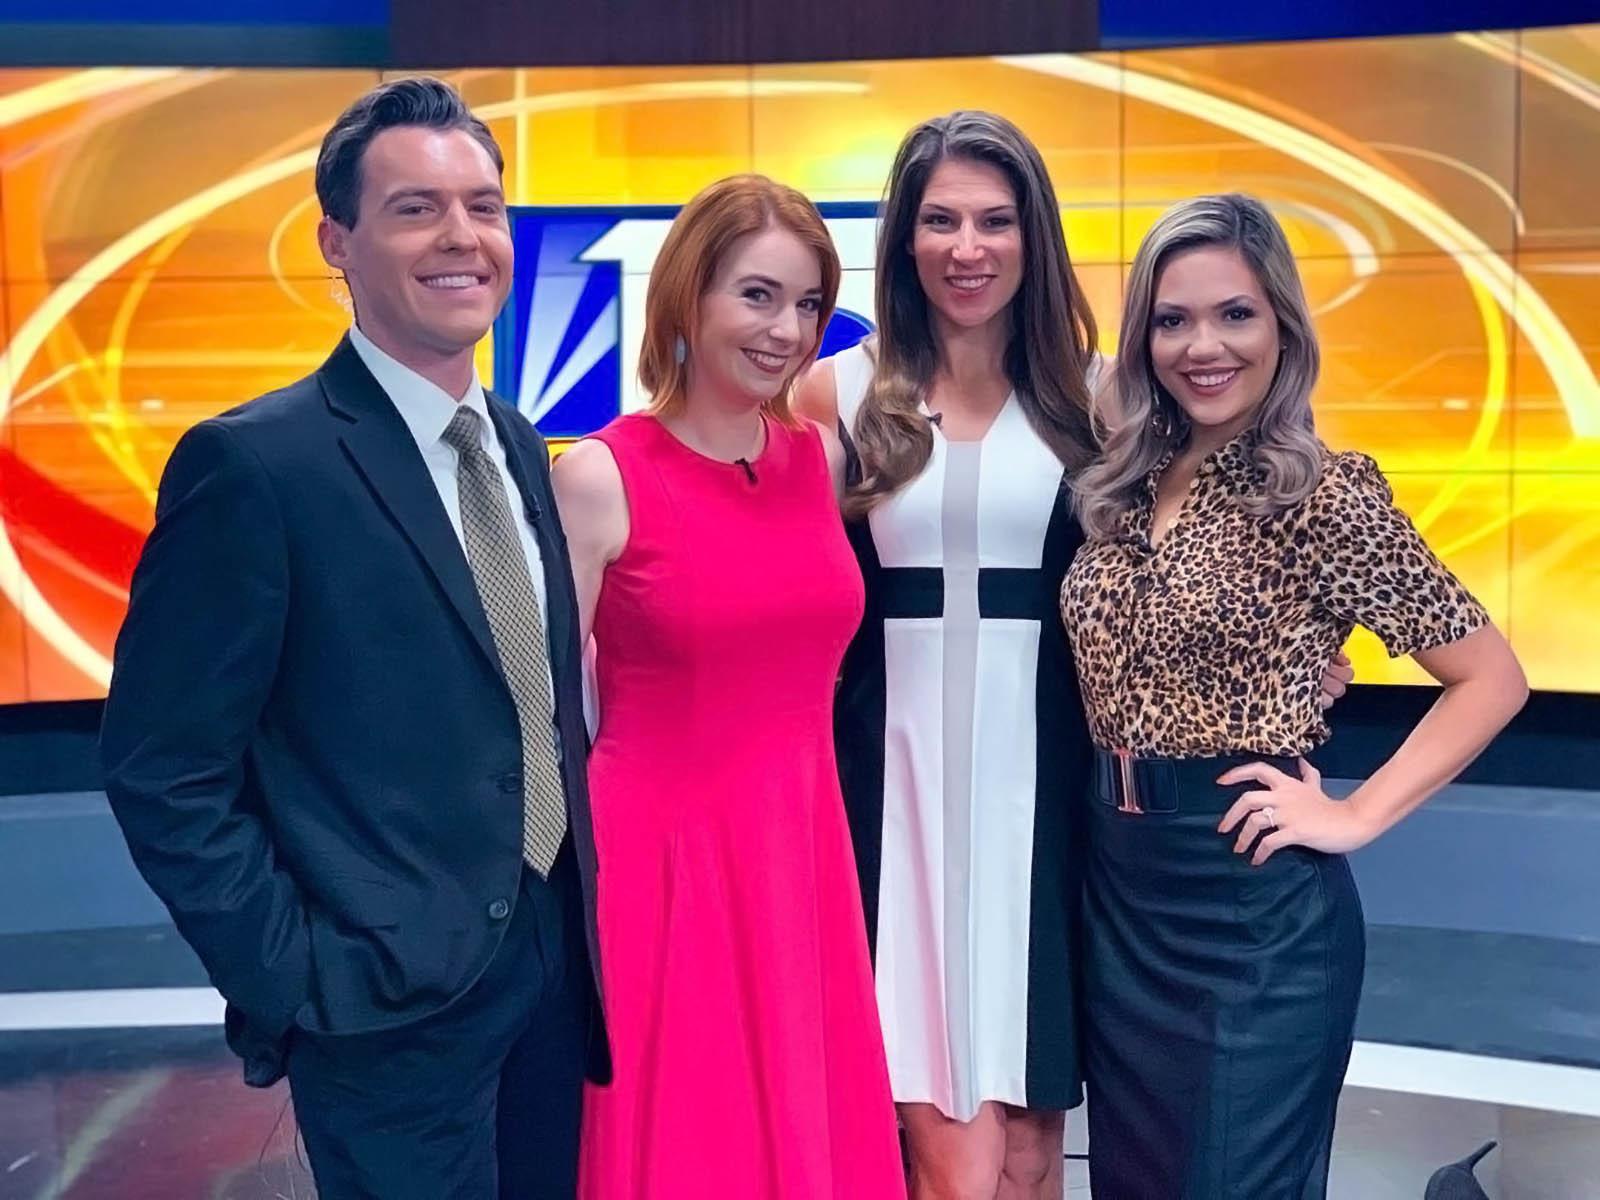 Matthew McClellan, Brainey, Kellie Cowan, and Vanessa Ruffes at Fox 13 News Tampa Bay